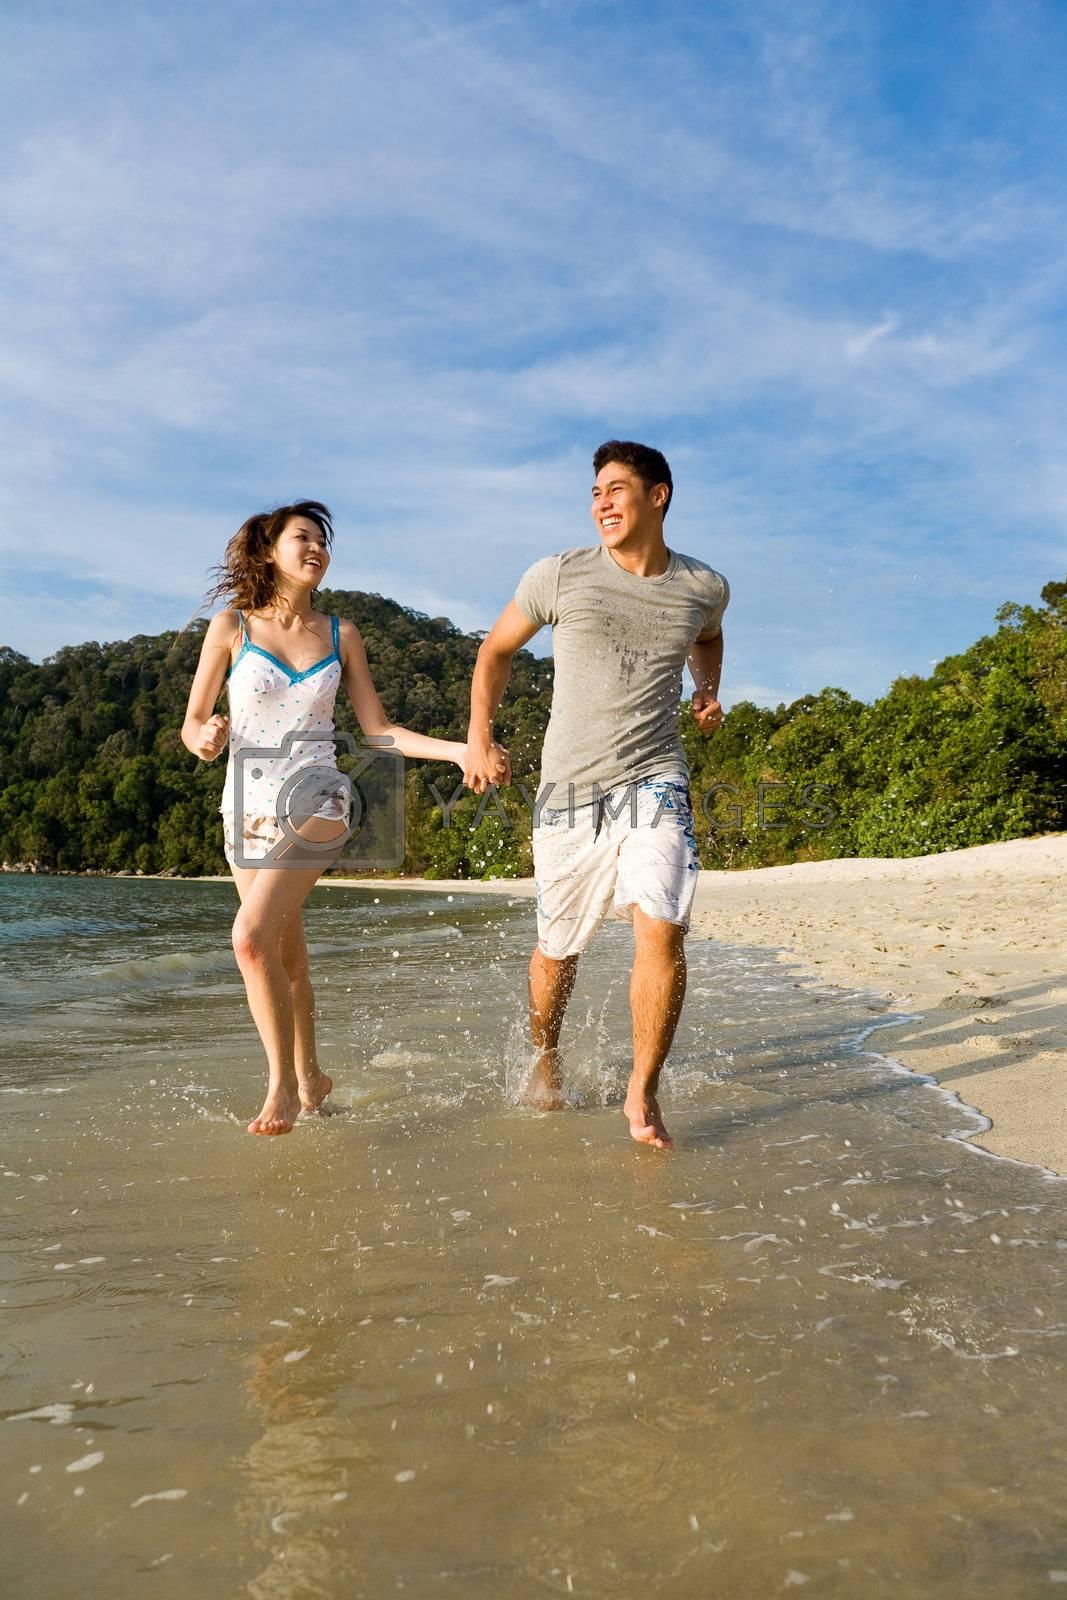 happy couple running along the beach by eyedear